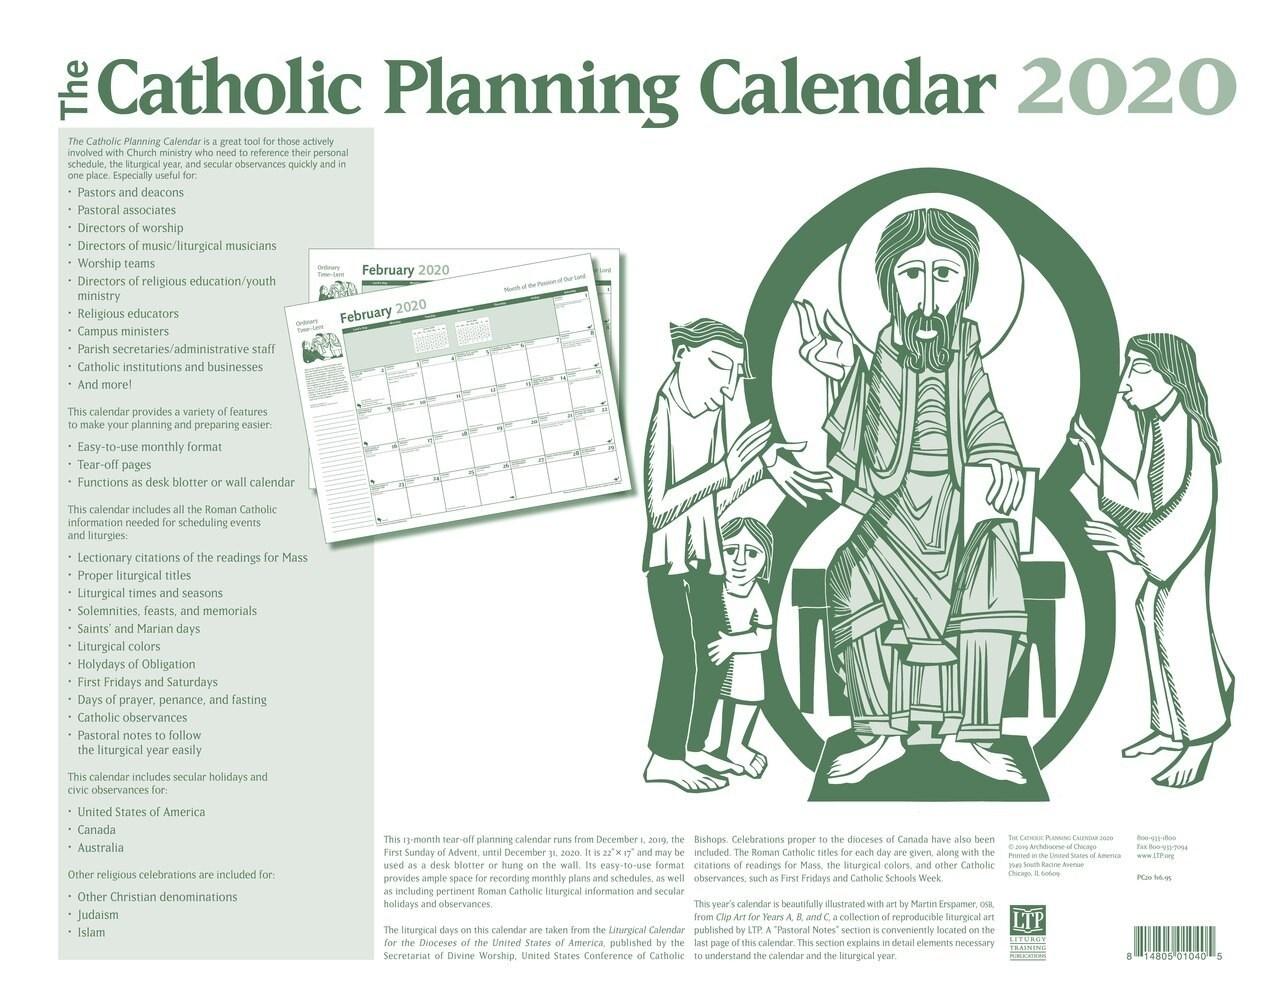 Liturgical Calendar Blank Worksheet | Printable Worksheets pertaining to Catholic Liturgical Calendar 2019 2020 Free Print